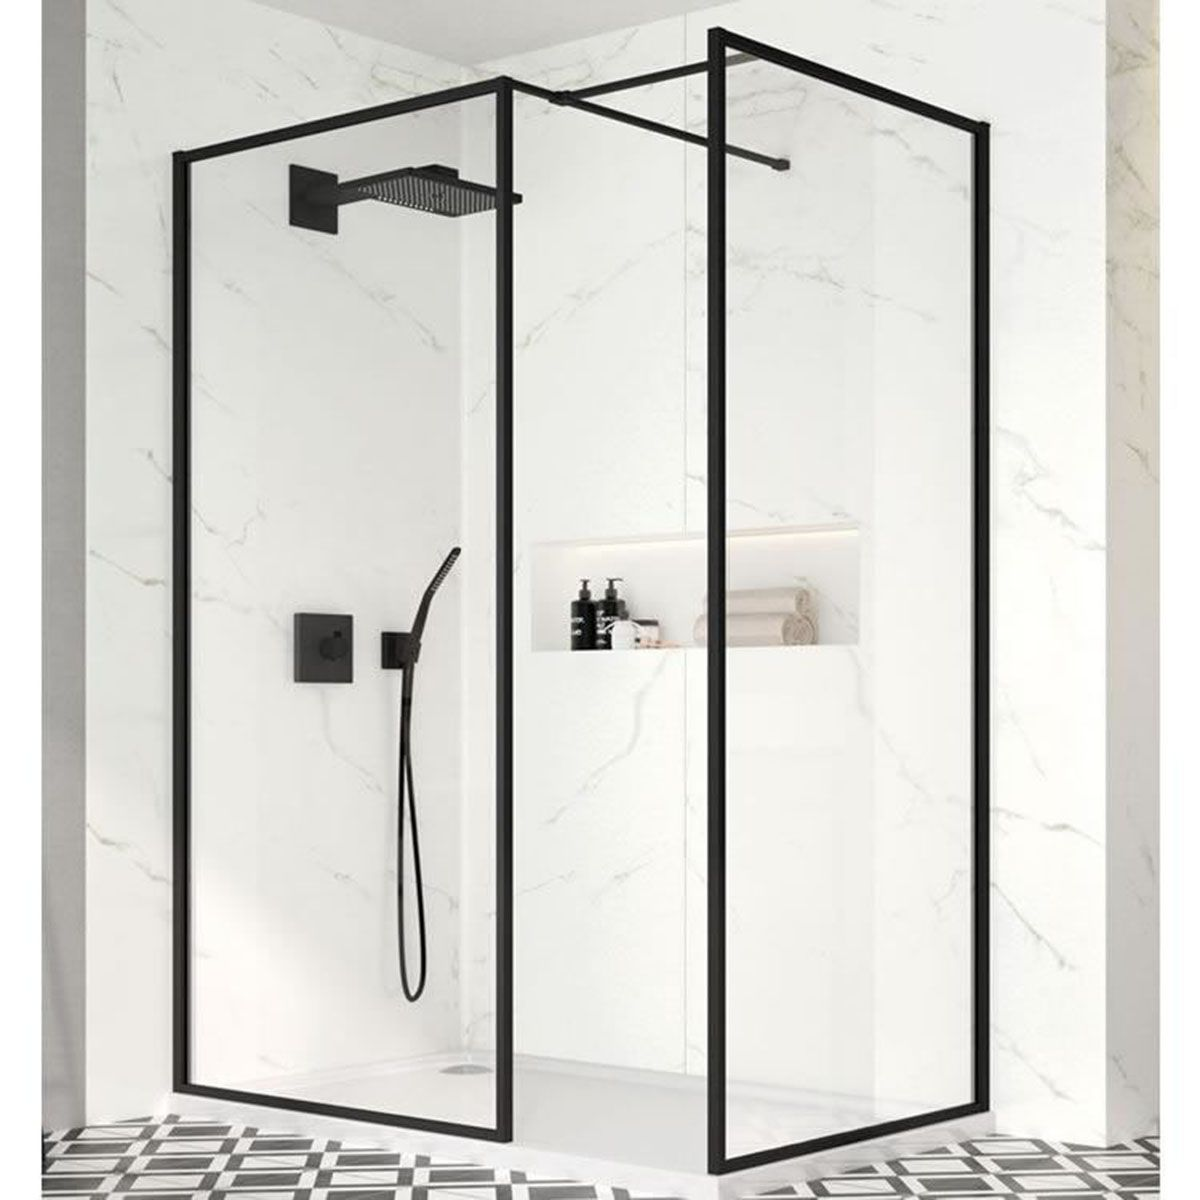 Merlyn Black Framed Shower Screen with Optional Side Panel